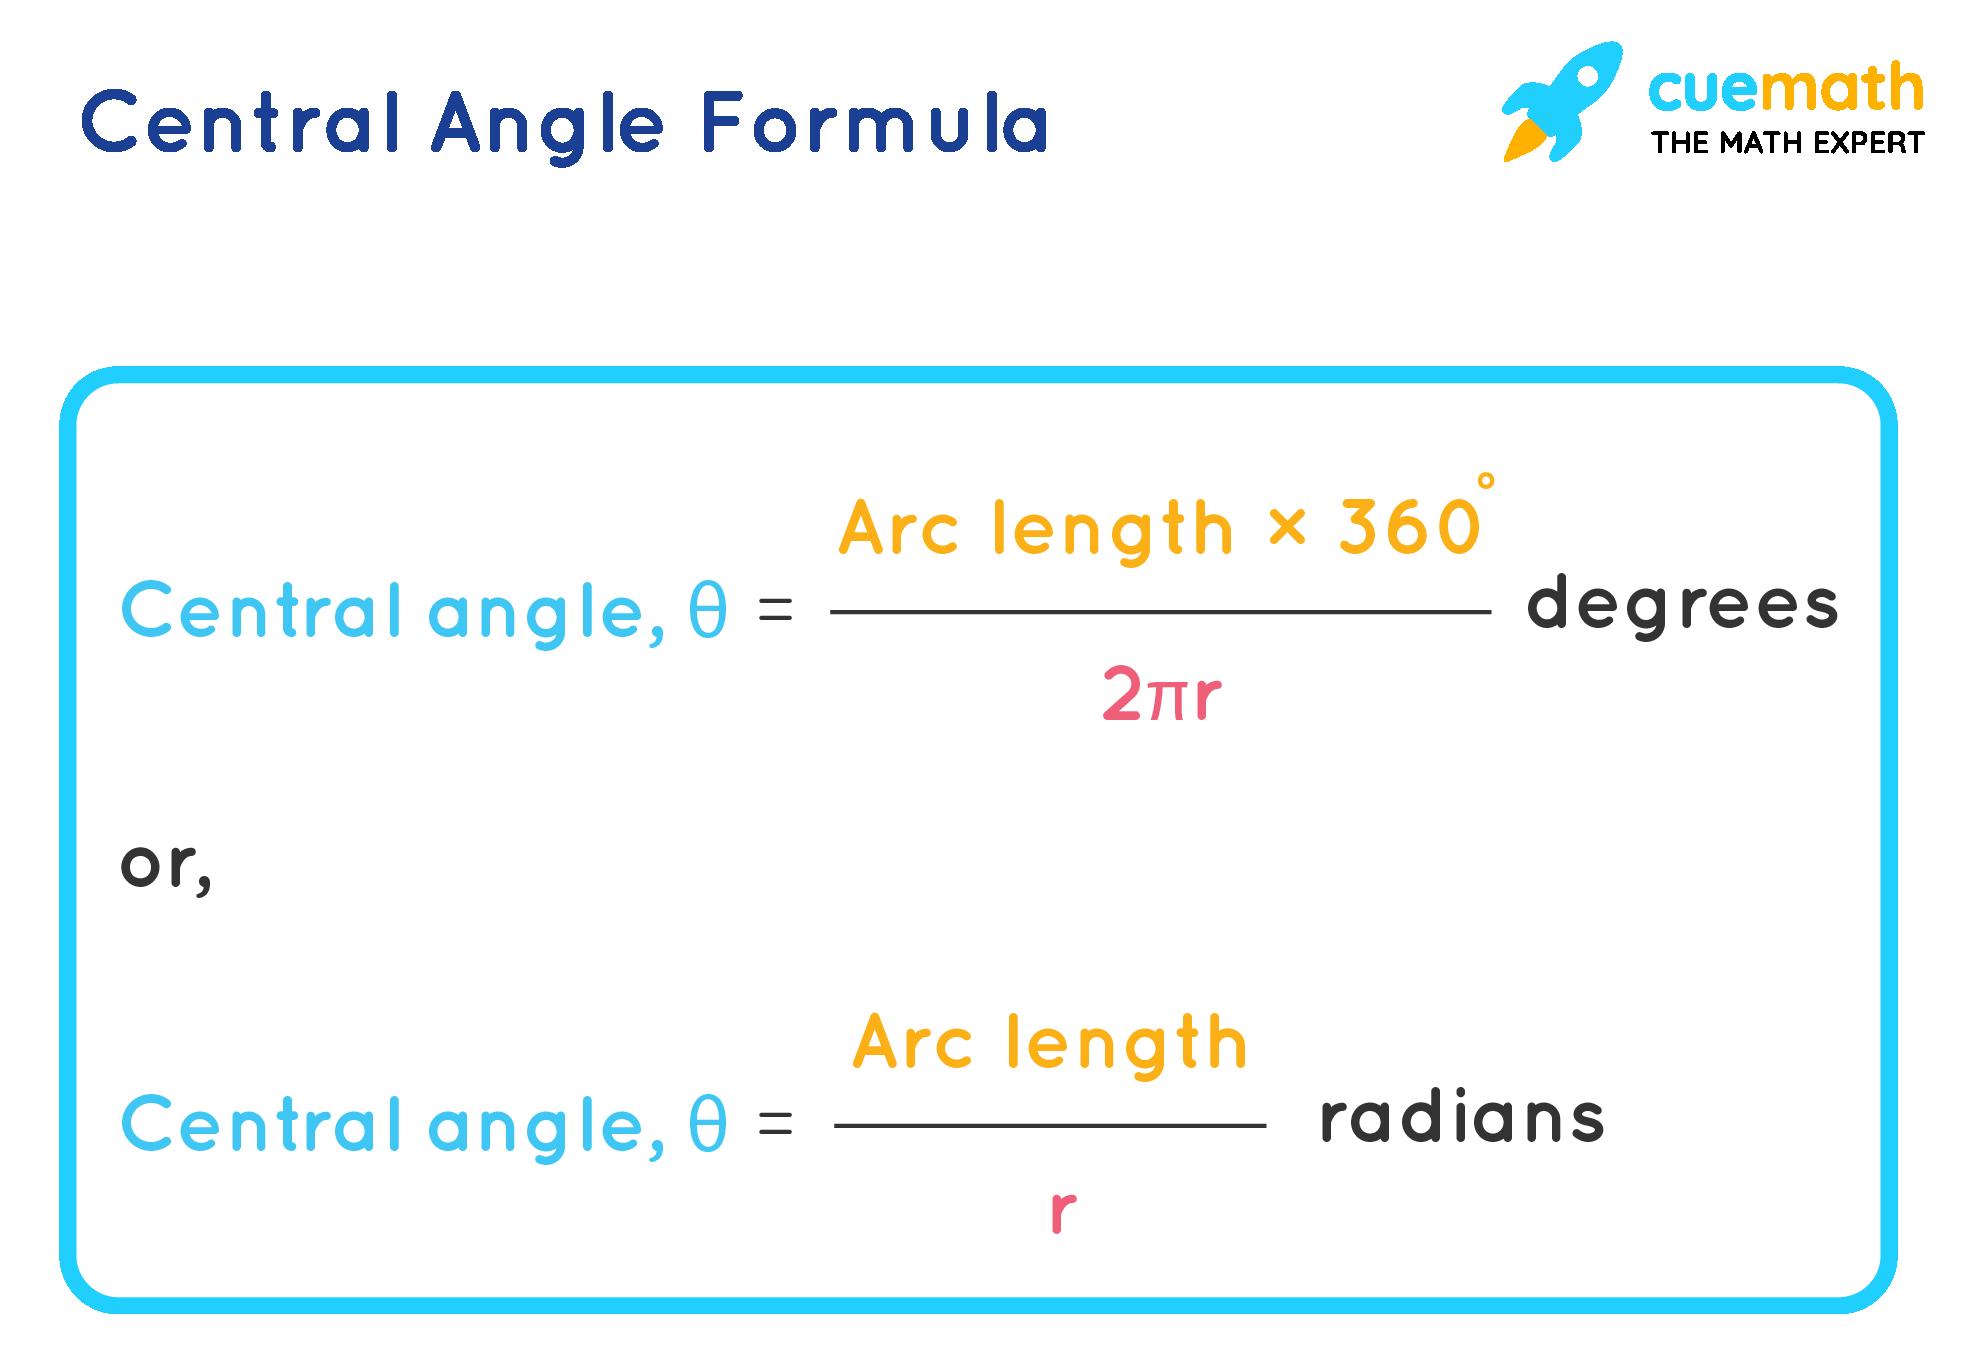 Central angle formula